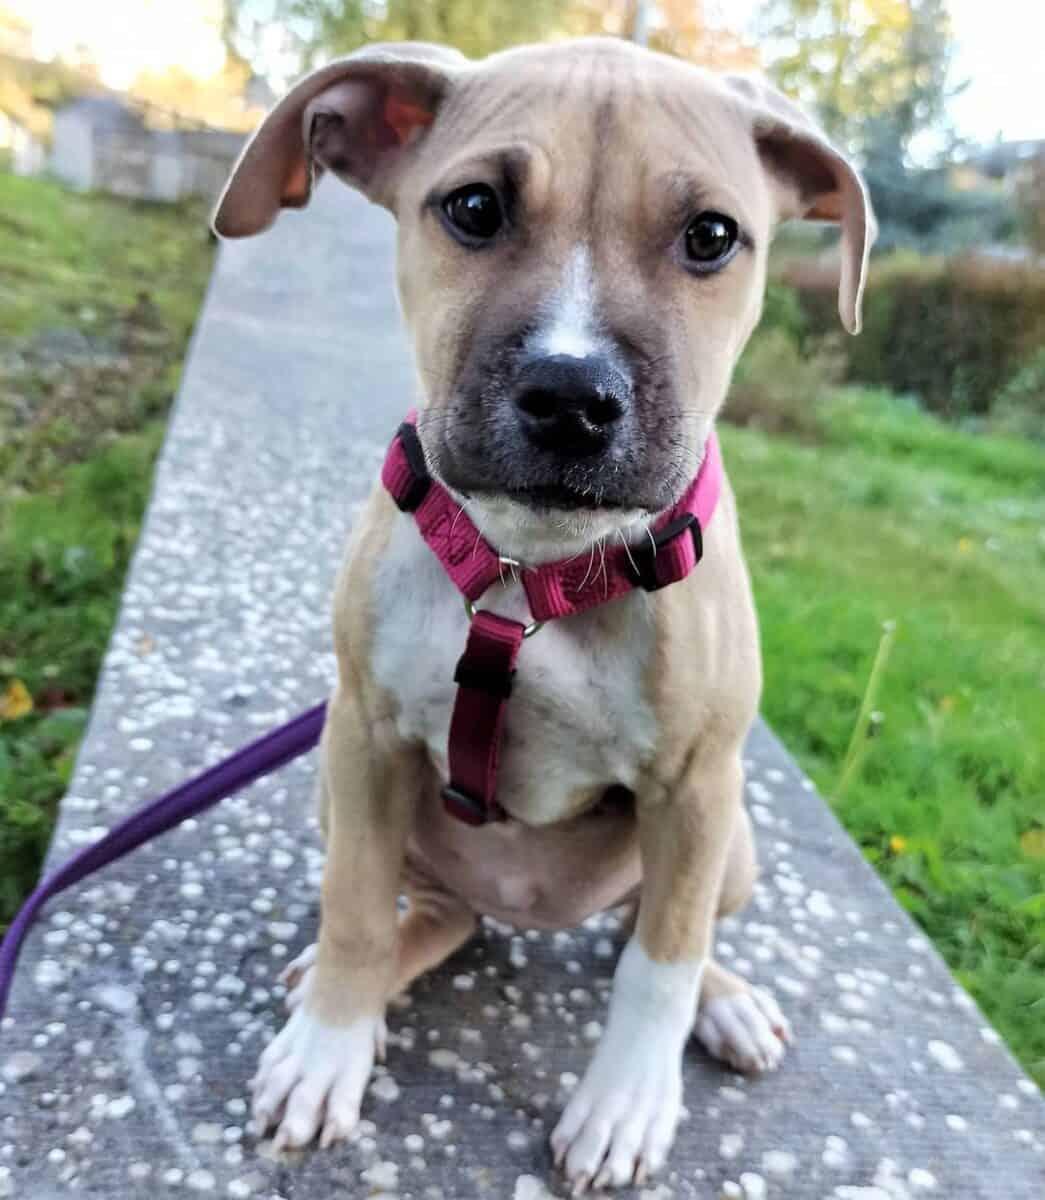 Buckskin Pitbull puppy on leash